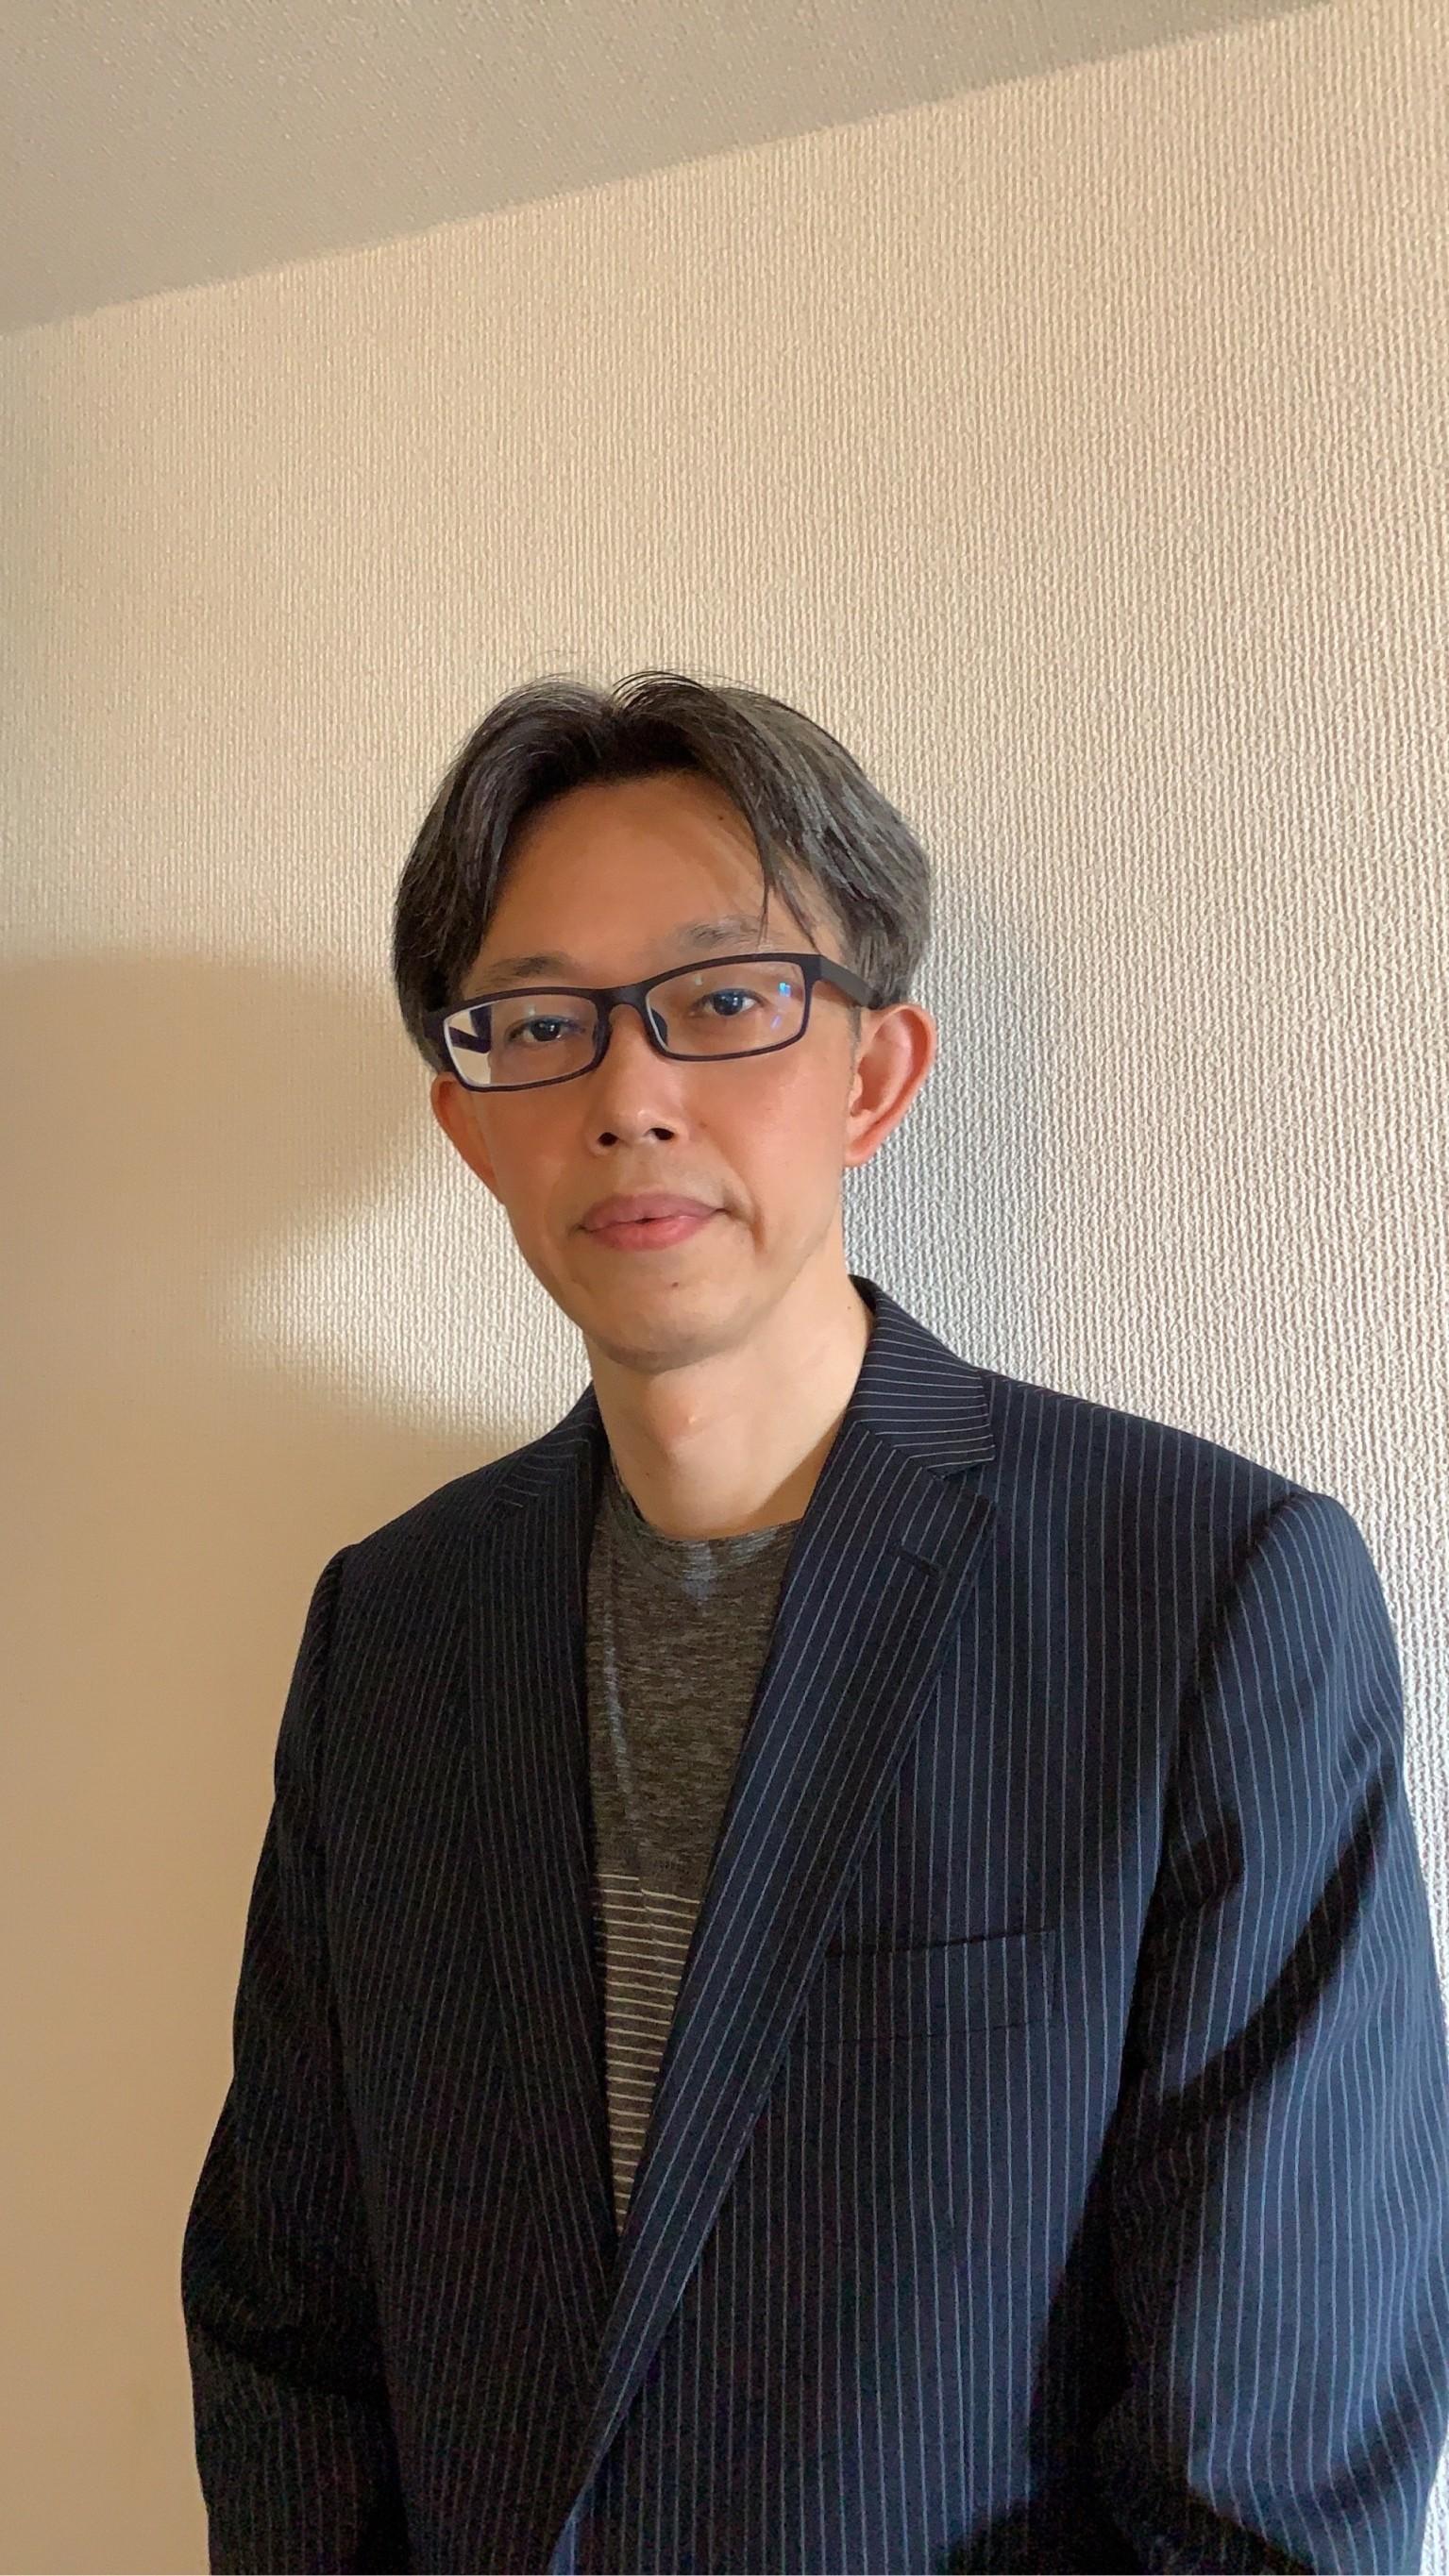 Chiyoda-Takahashi